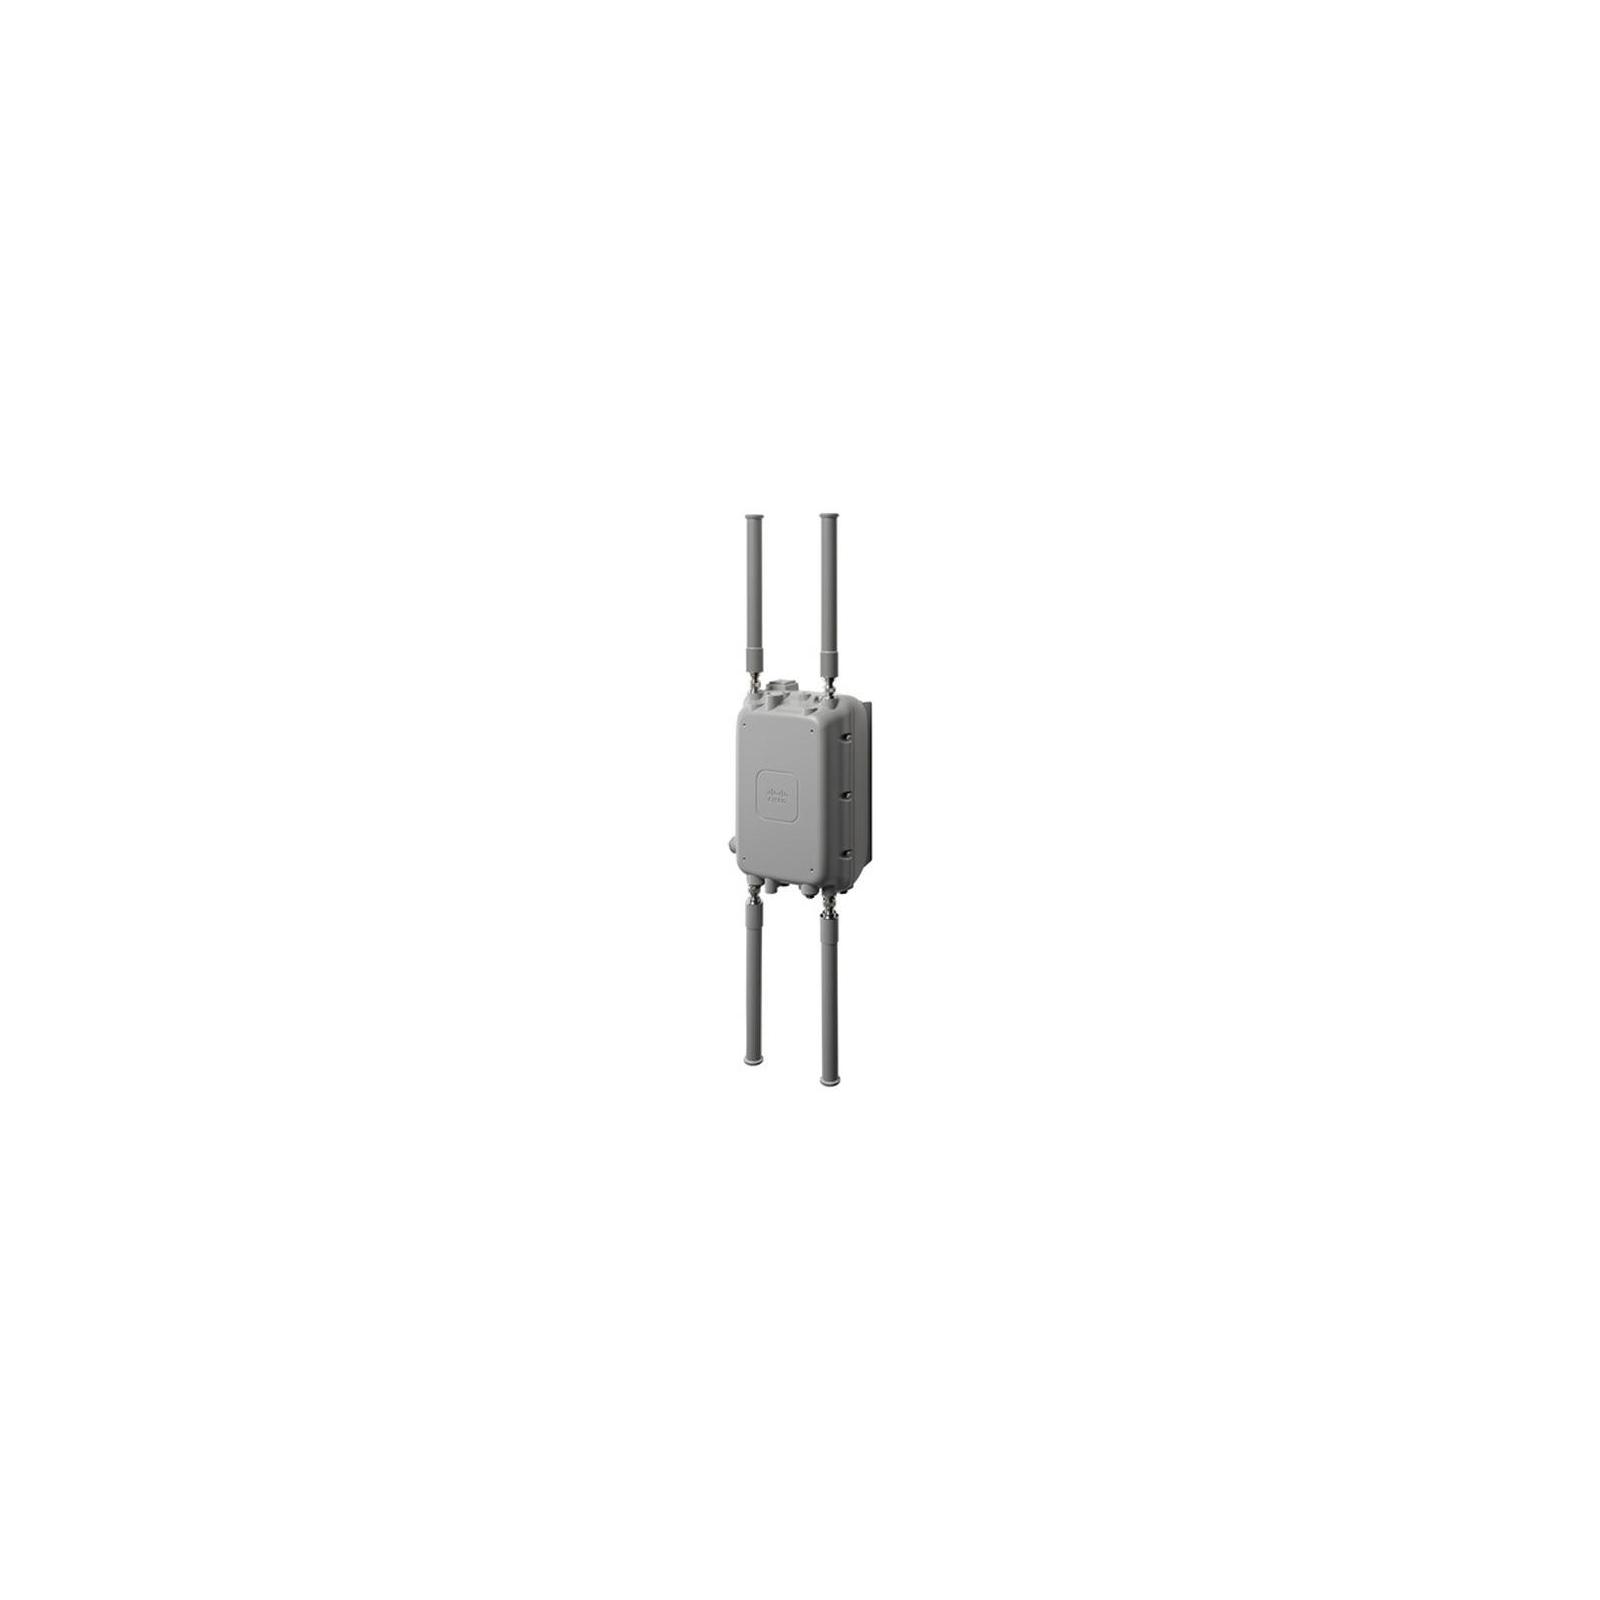 Точка доступа Wi-Fi Cisco AIR-AP1572EAC-E-K9 изображение 5